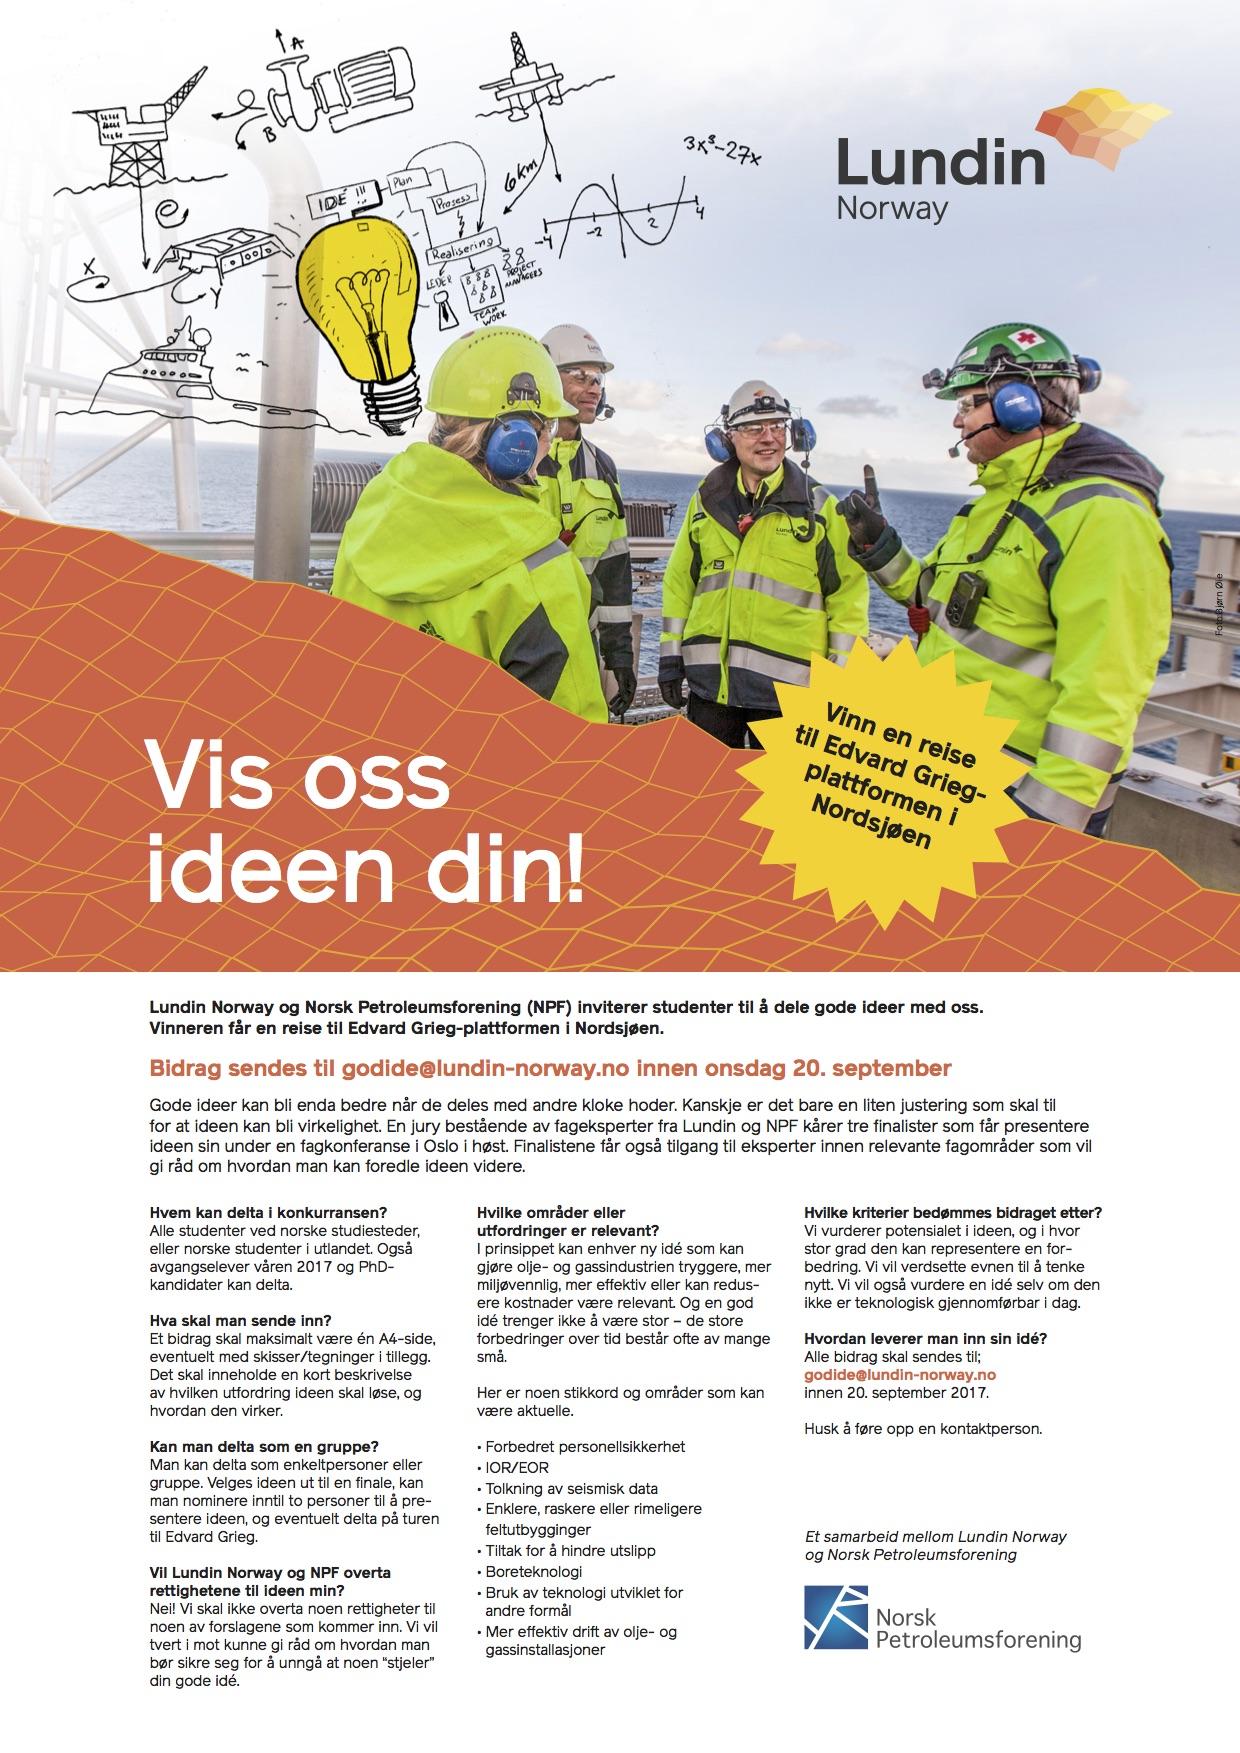 Idekonkurranse_Lundin_norsk2017.jpg